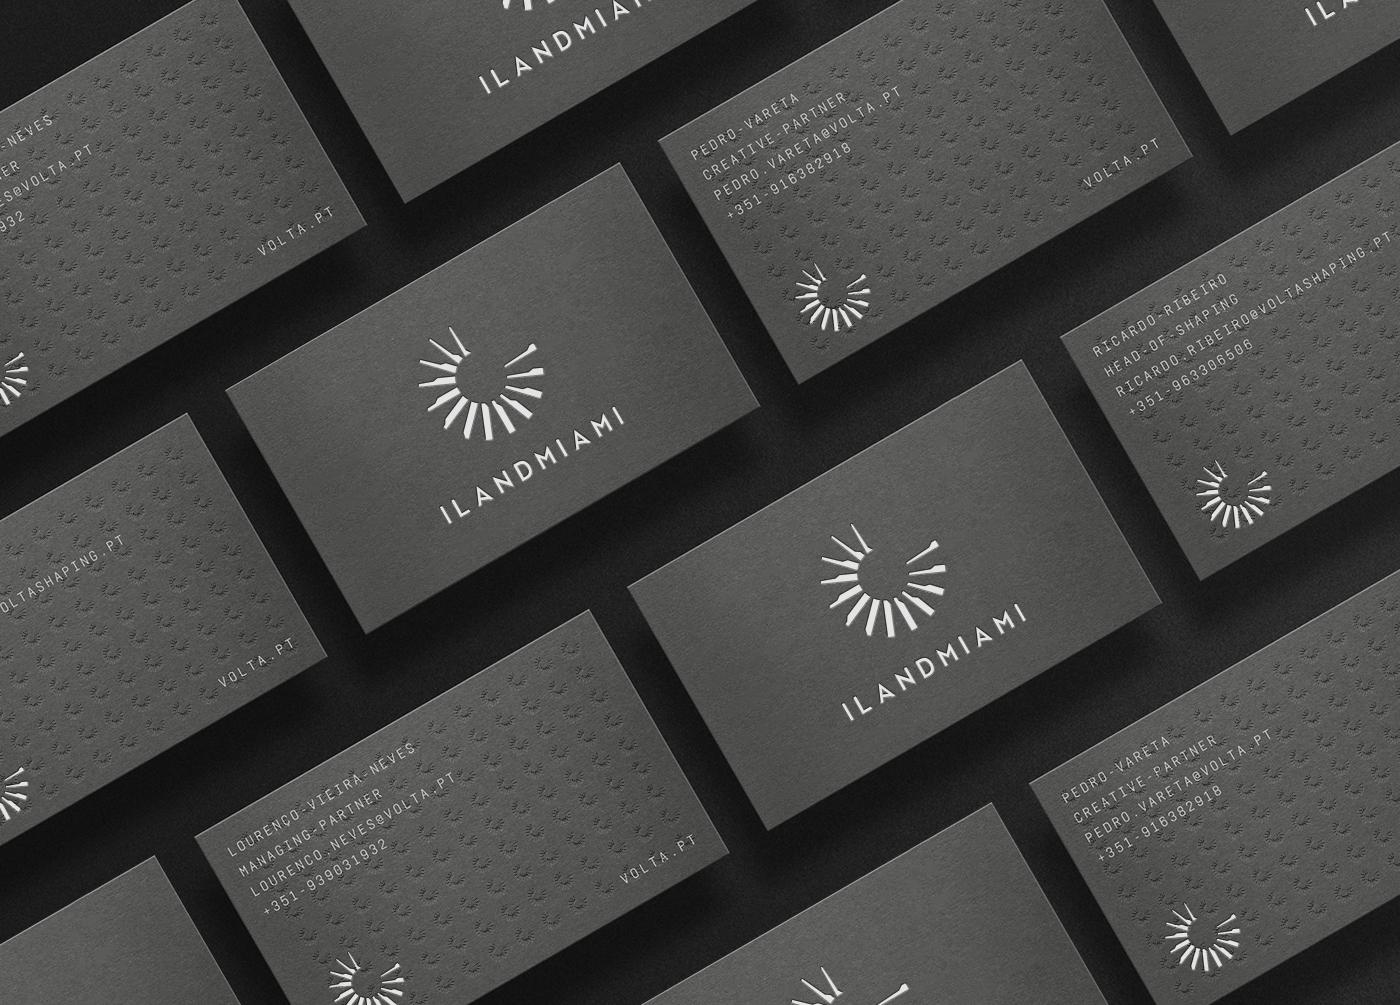 ilandmiami business card design